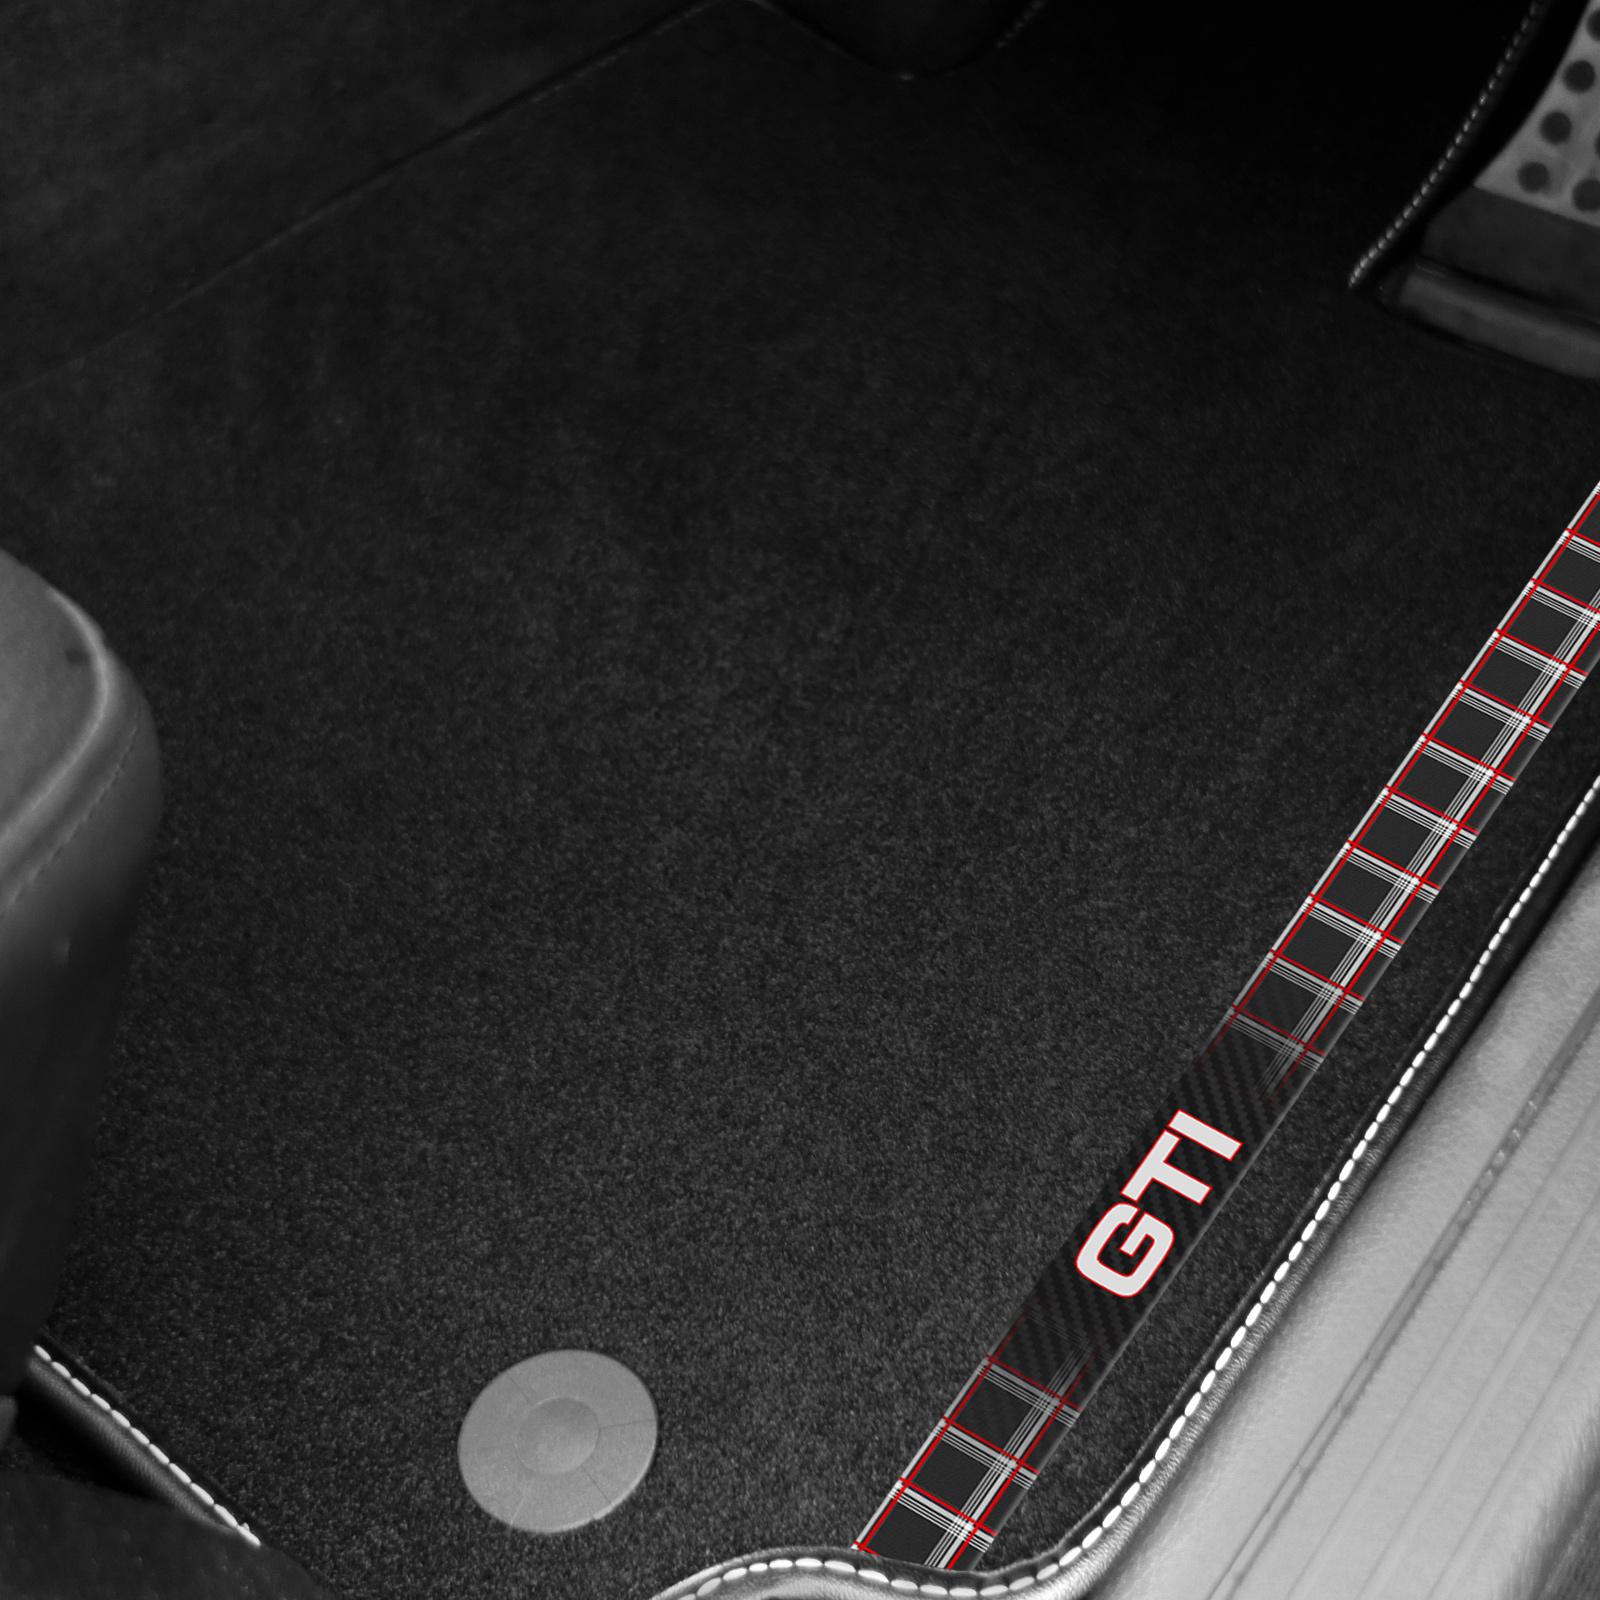 COTTON LINED VW VOLKSWAGEN CORRADO 89-96 LUXURY FULLY WATERPROOF CAR COVER